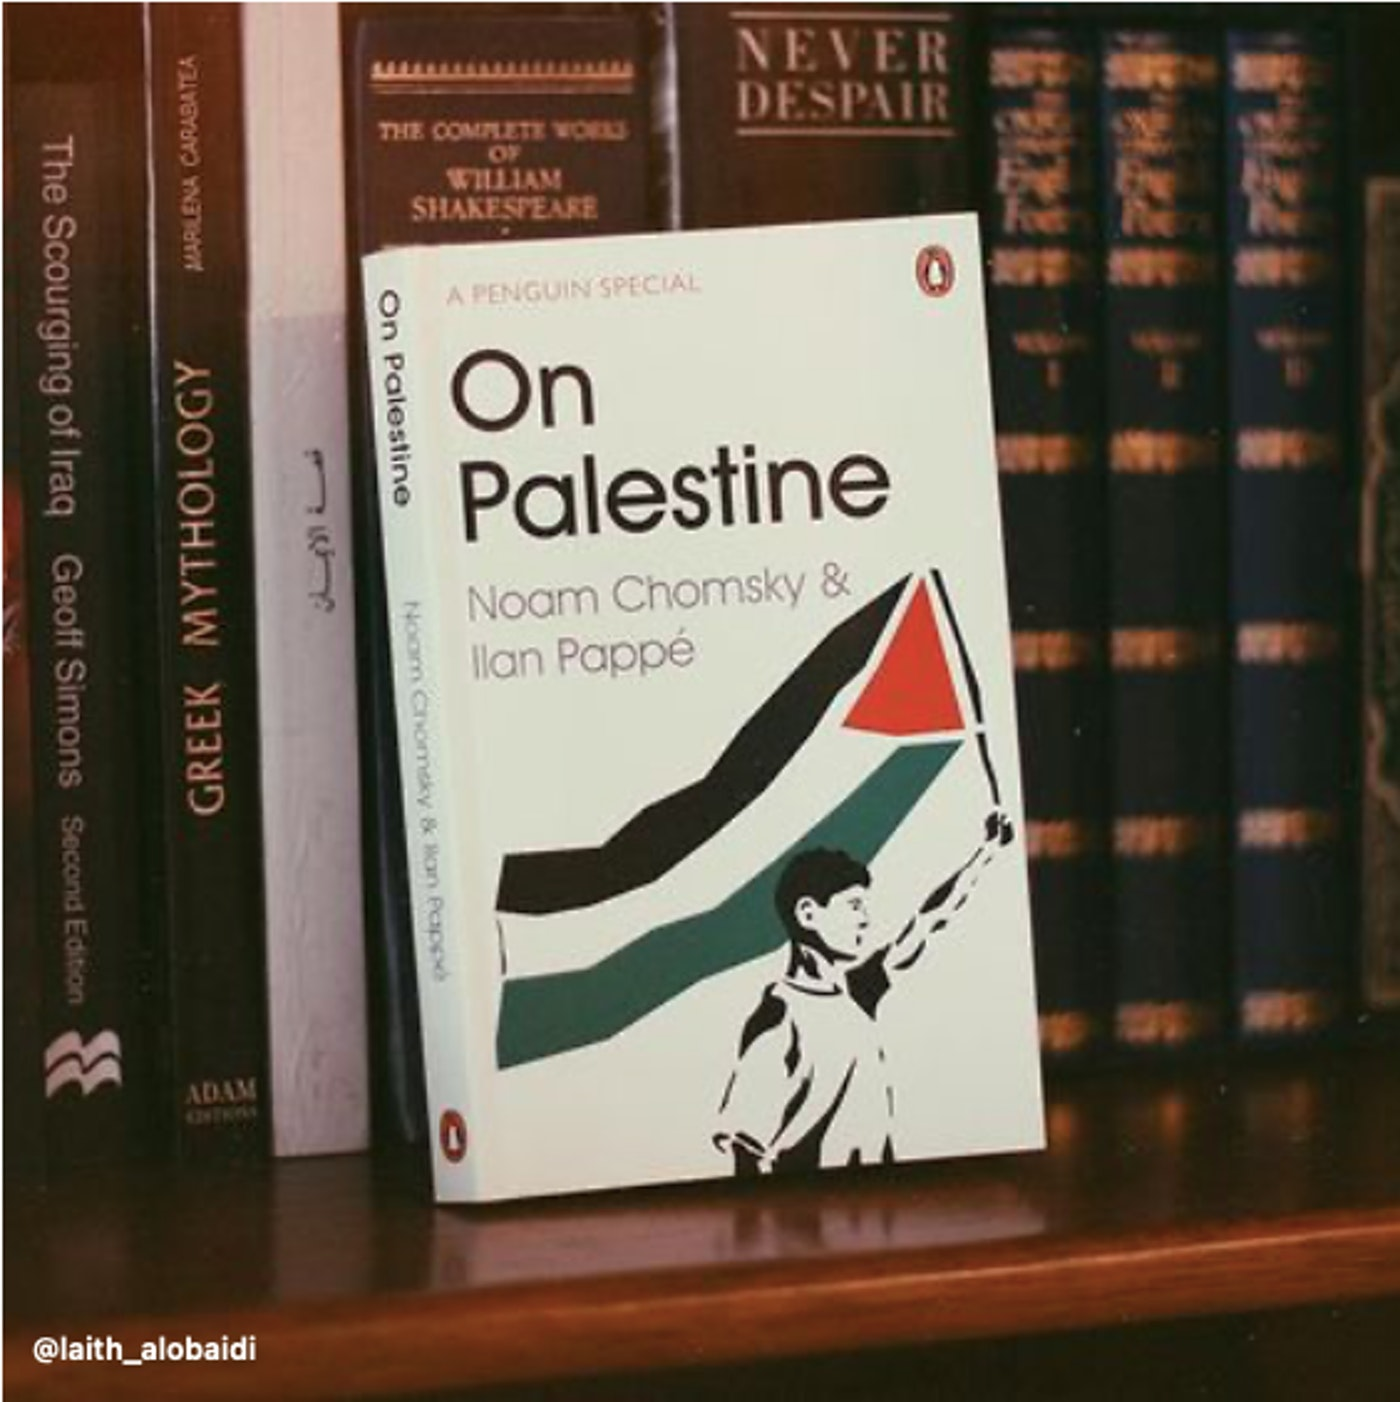 Book On Palestine